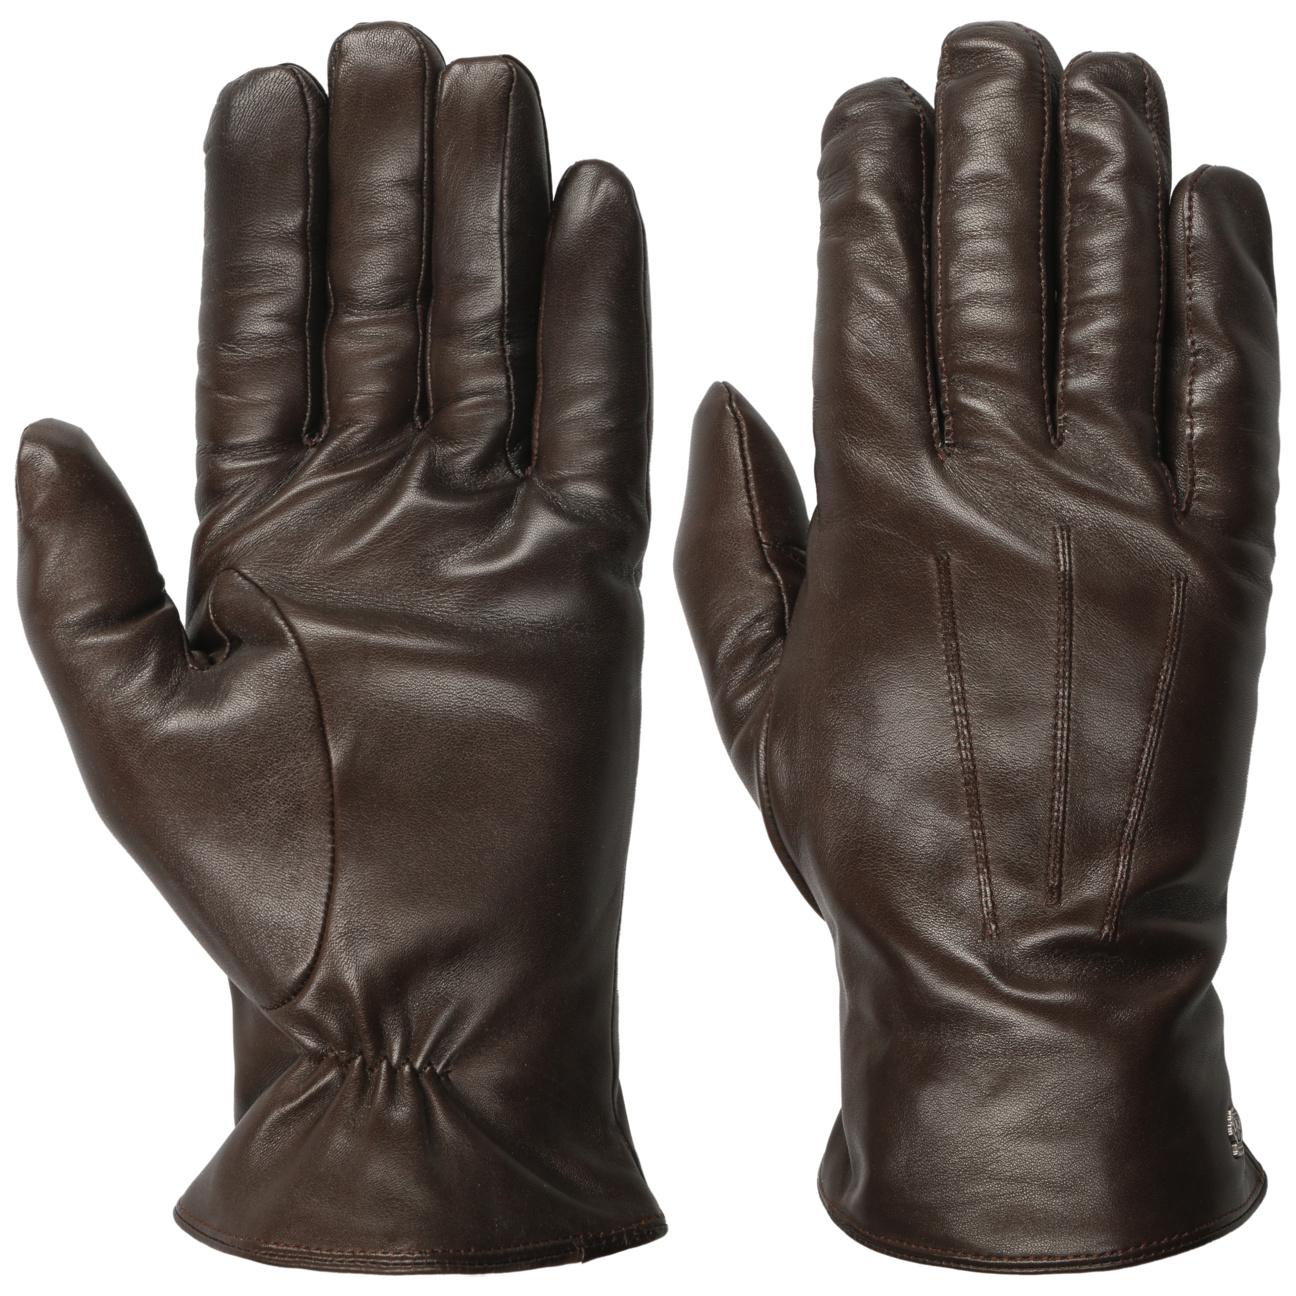 Guantes de Hombre Klassik by Roeckl  guantes